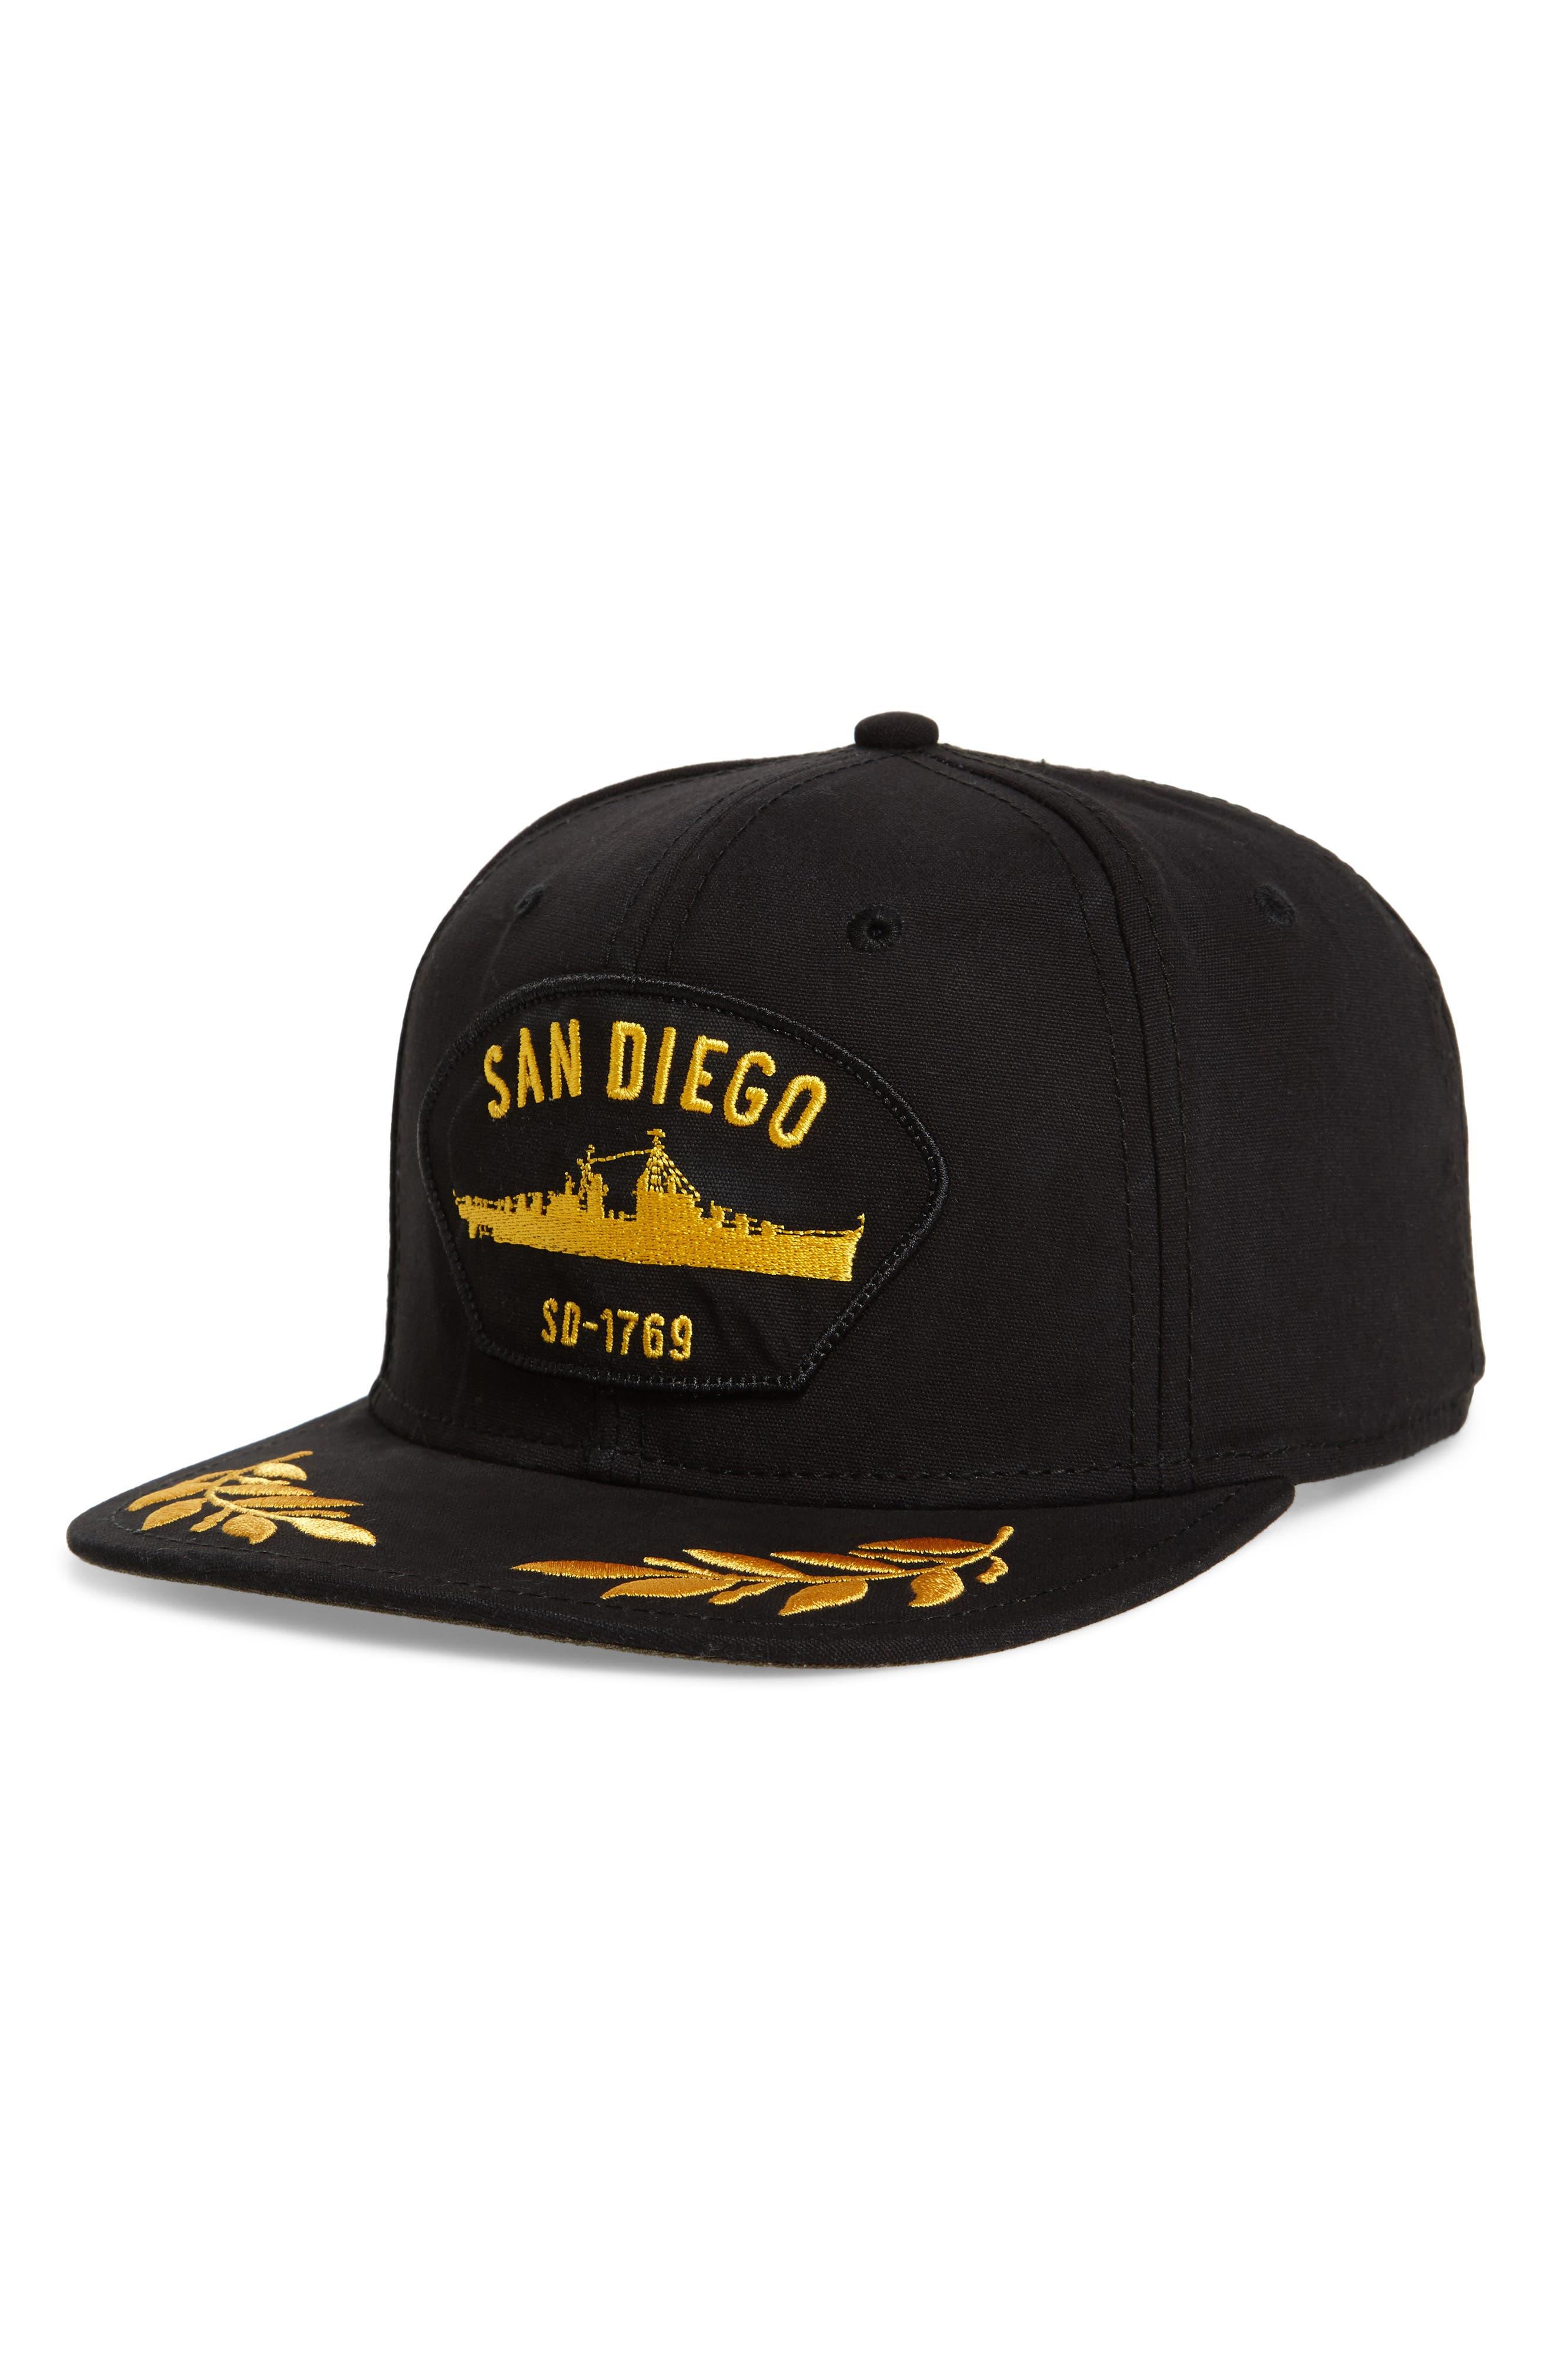 Alternate Image 1 Selected - Goorin Brothers San Diego Snapback Baseball Cap